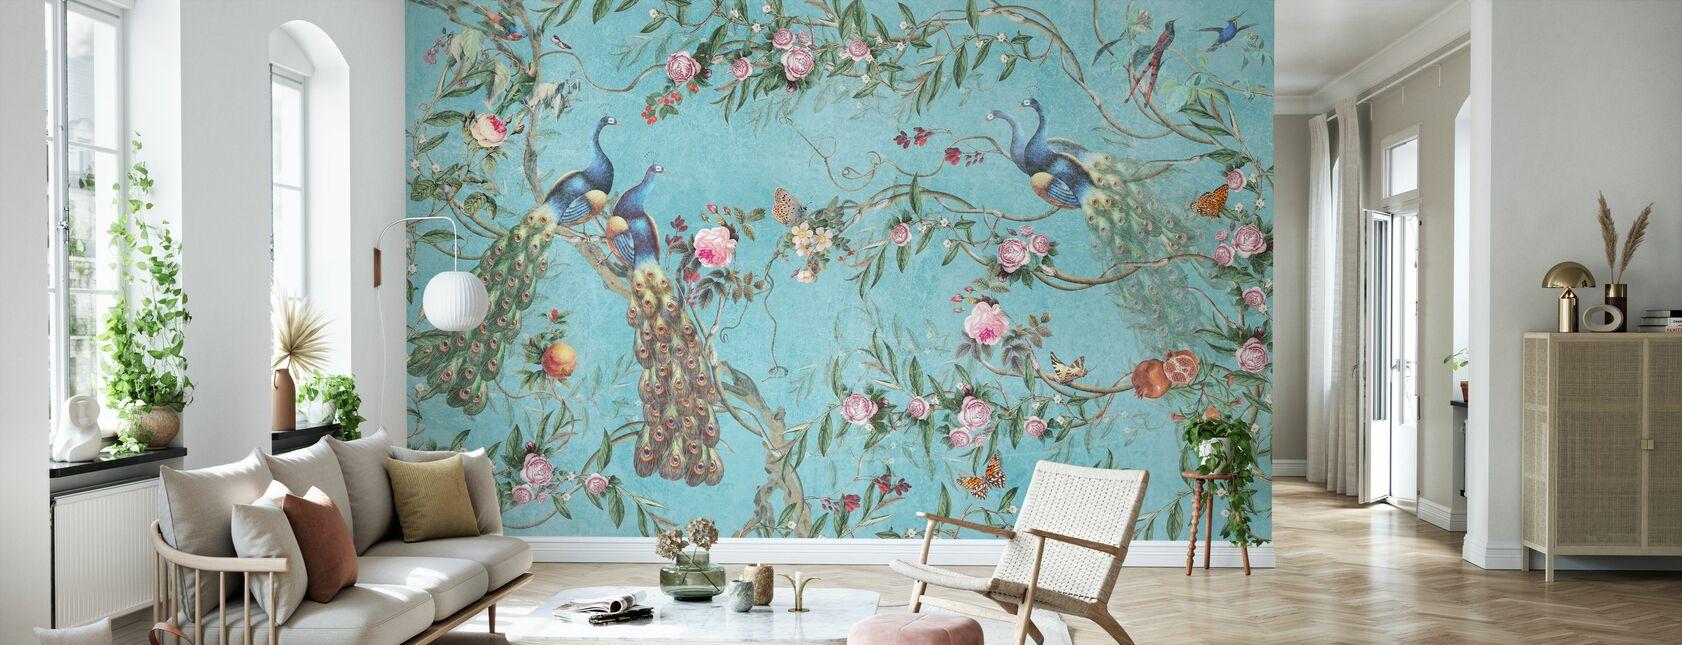 Påfugle og blomster - Tapet - Stue